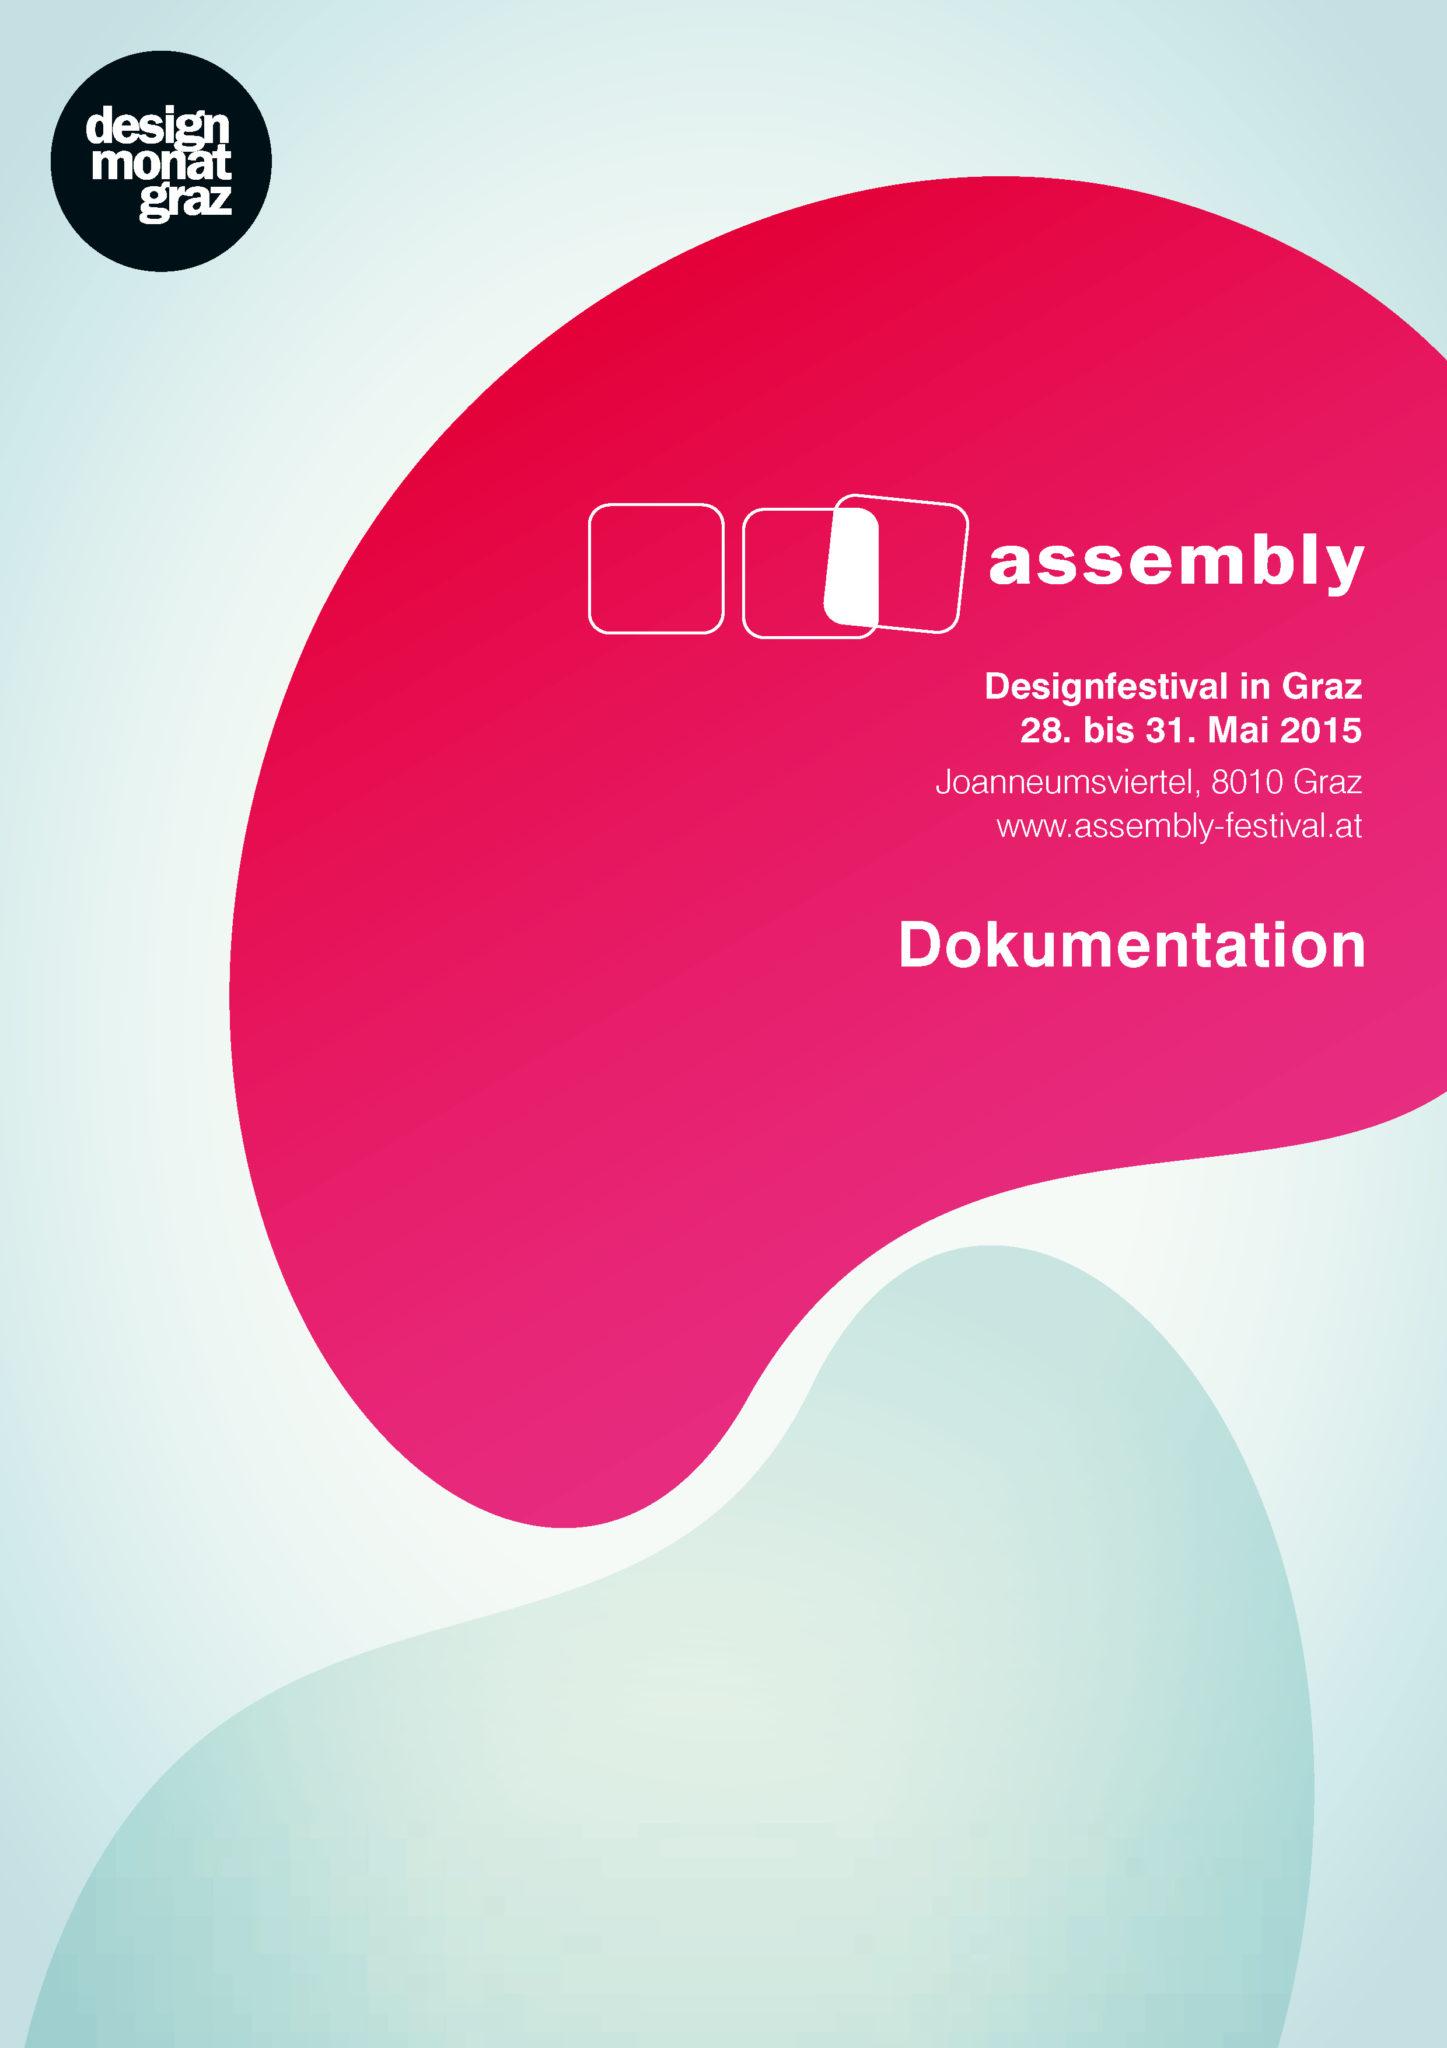 assembly Festival Archive 2015